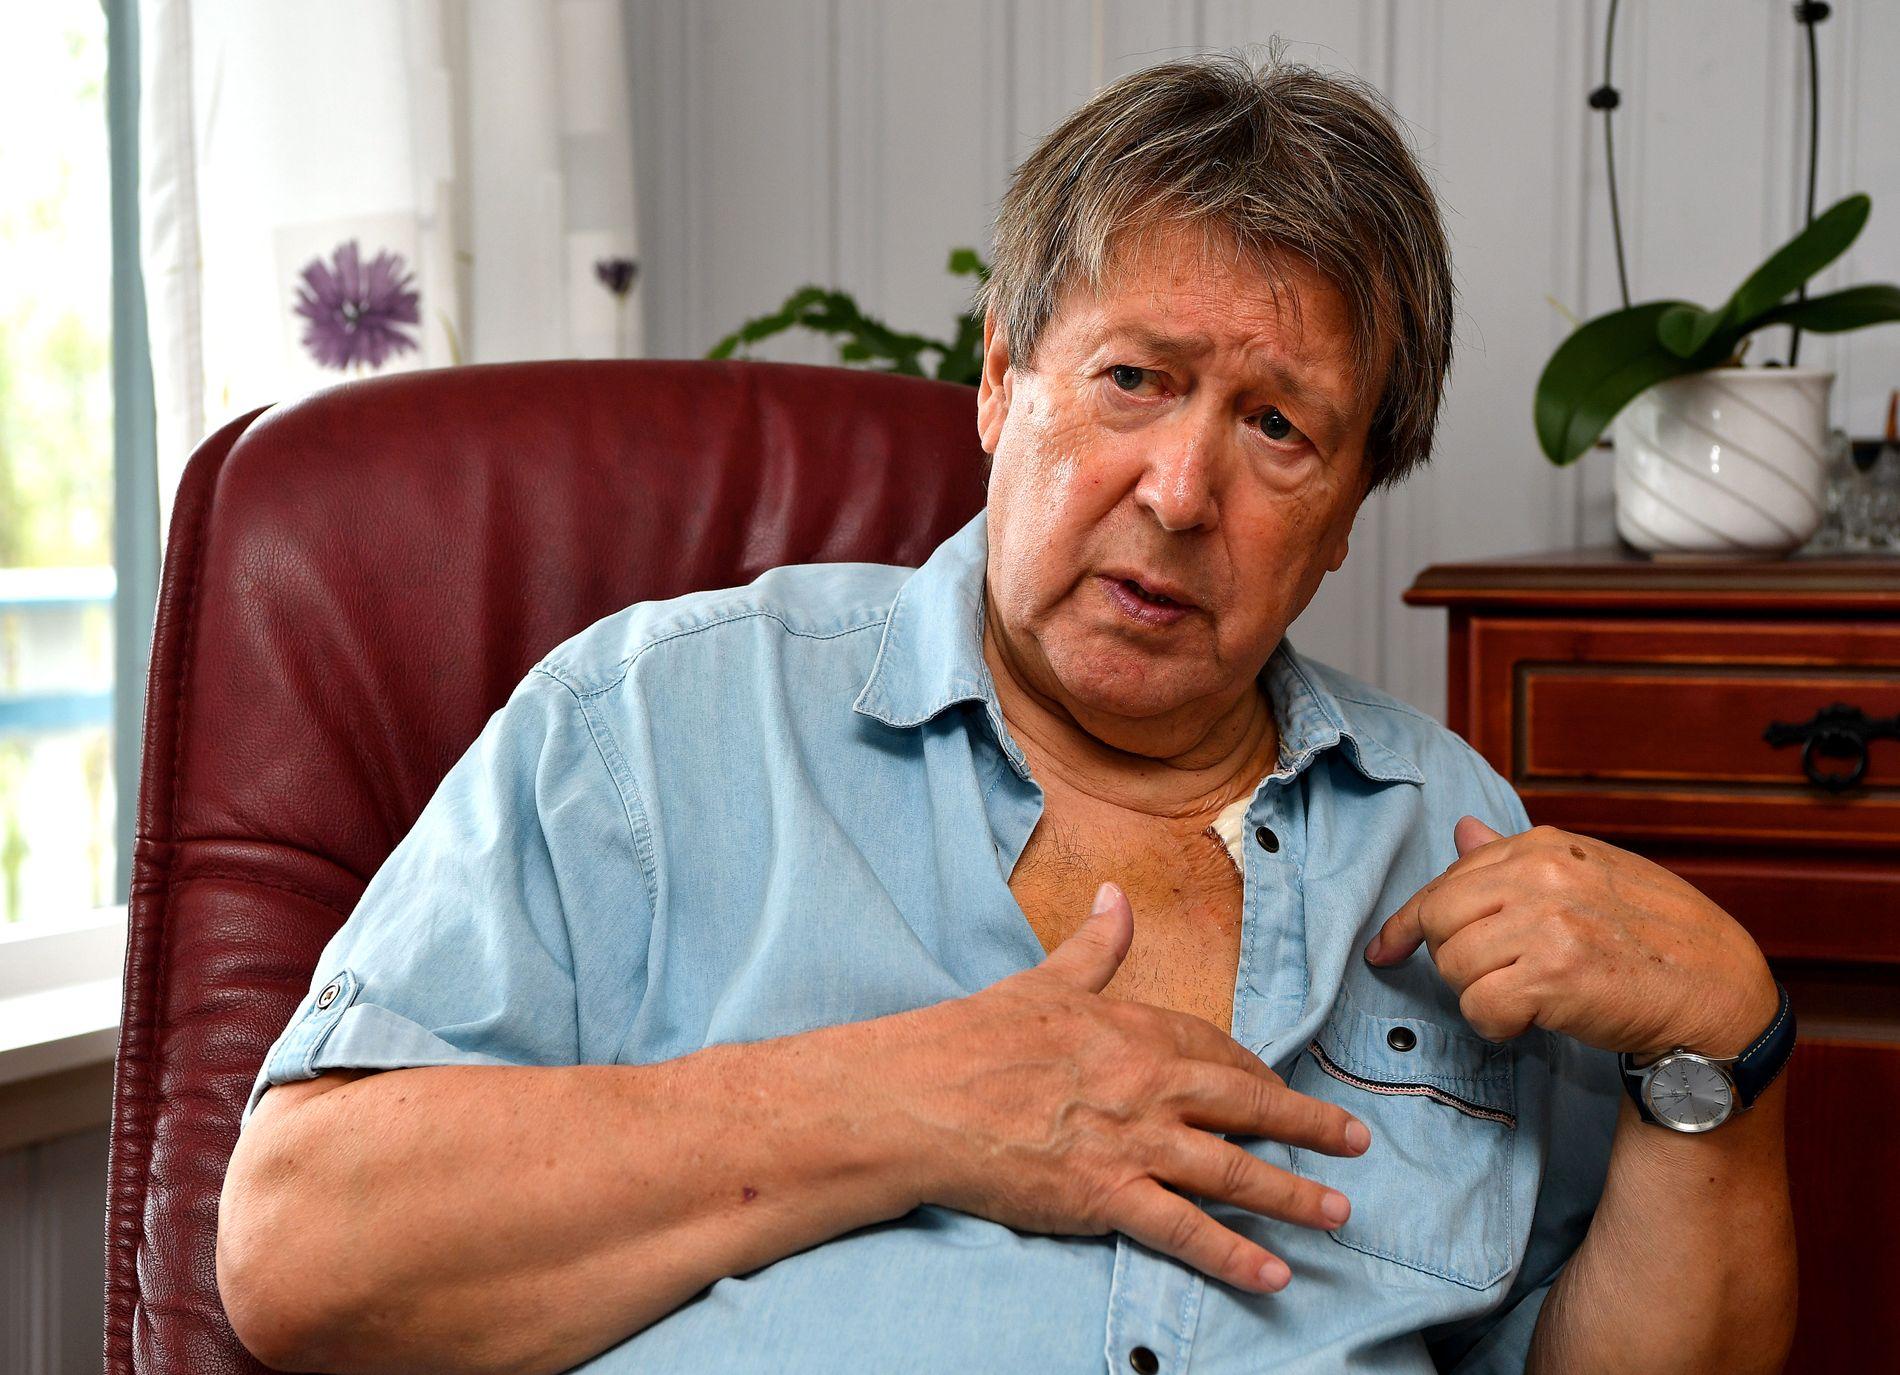 f680ab1e0 Tore Skoglund (70) i bilulykke hjemme på Senja: – Plutselig var jeg ...